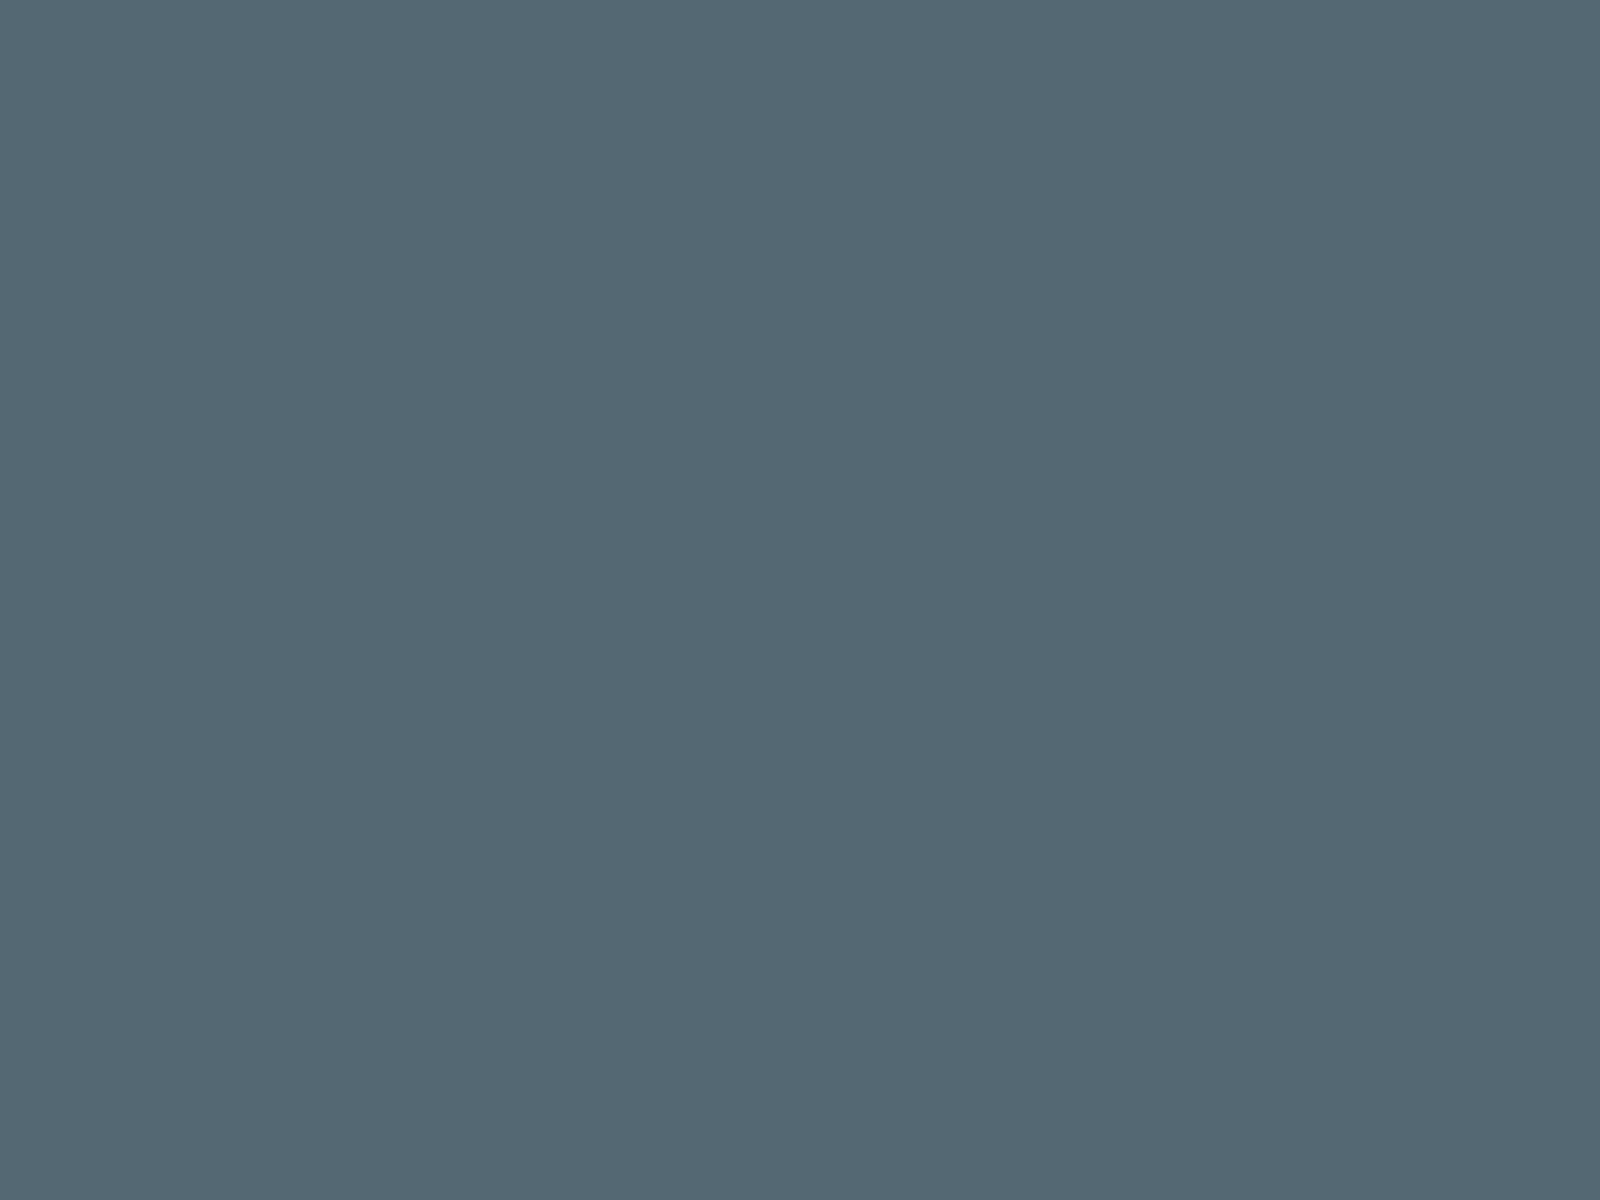 1600x1200 Cadet Solid Color Background